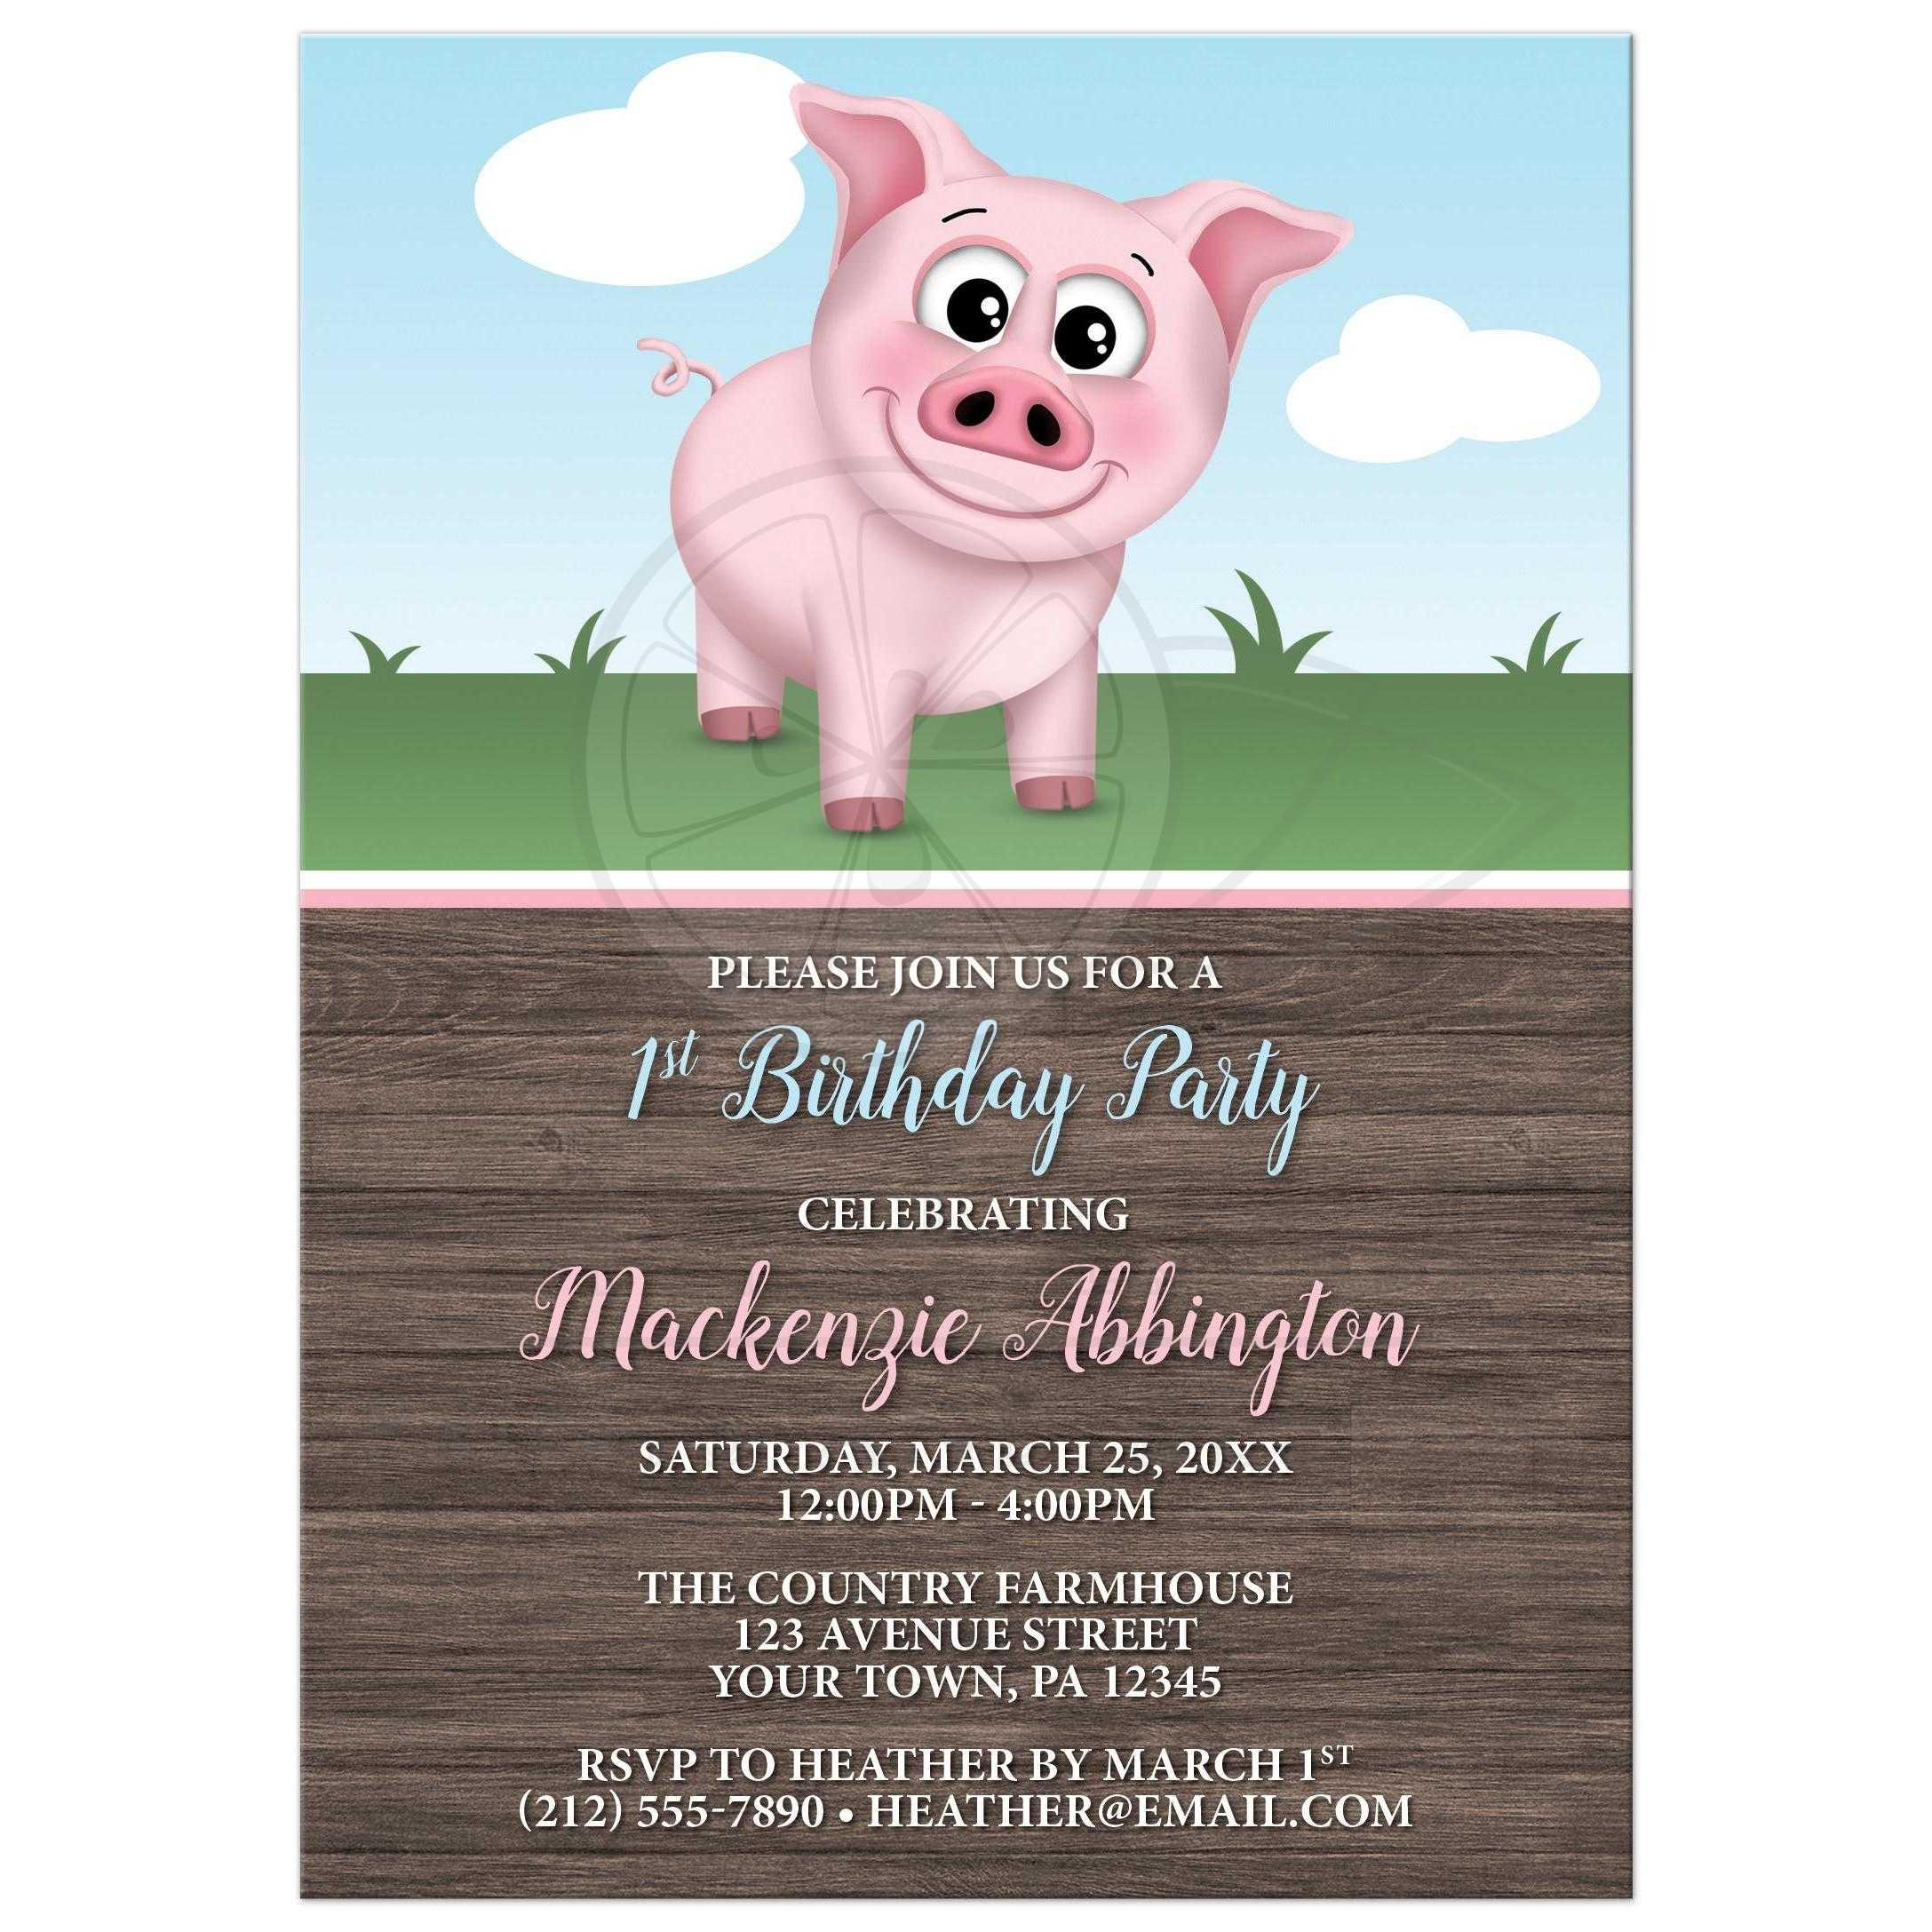 Birthday Party Invitations - Happy Pink Pig on the Farm - Barnyard